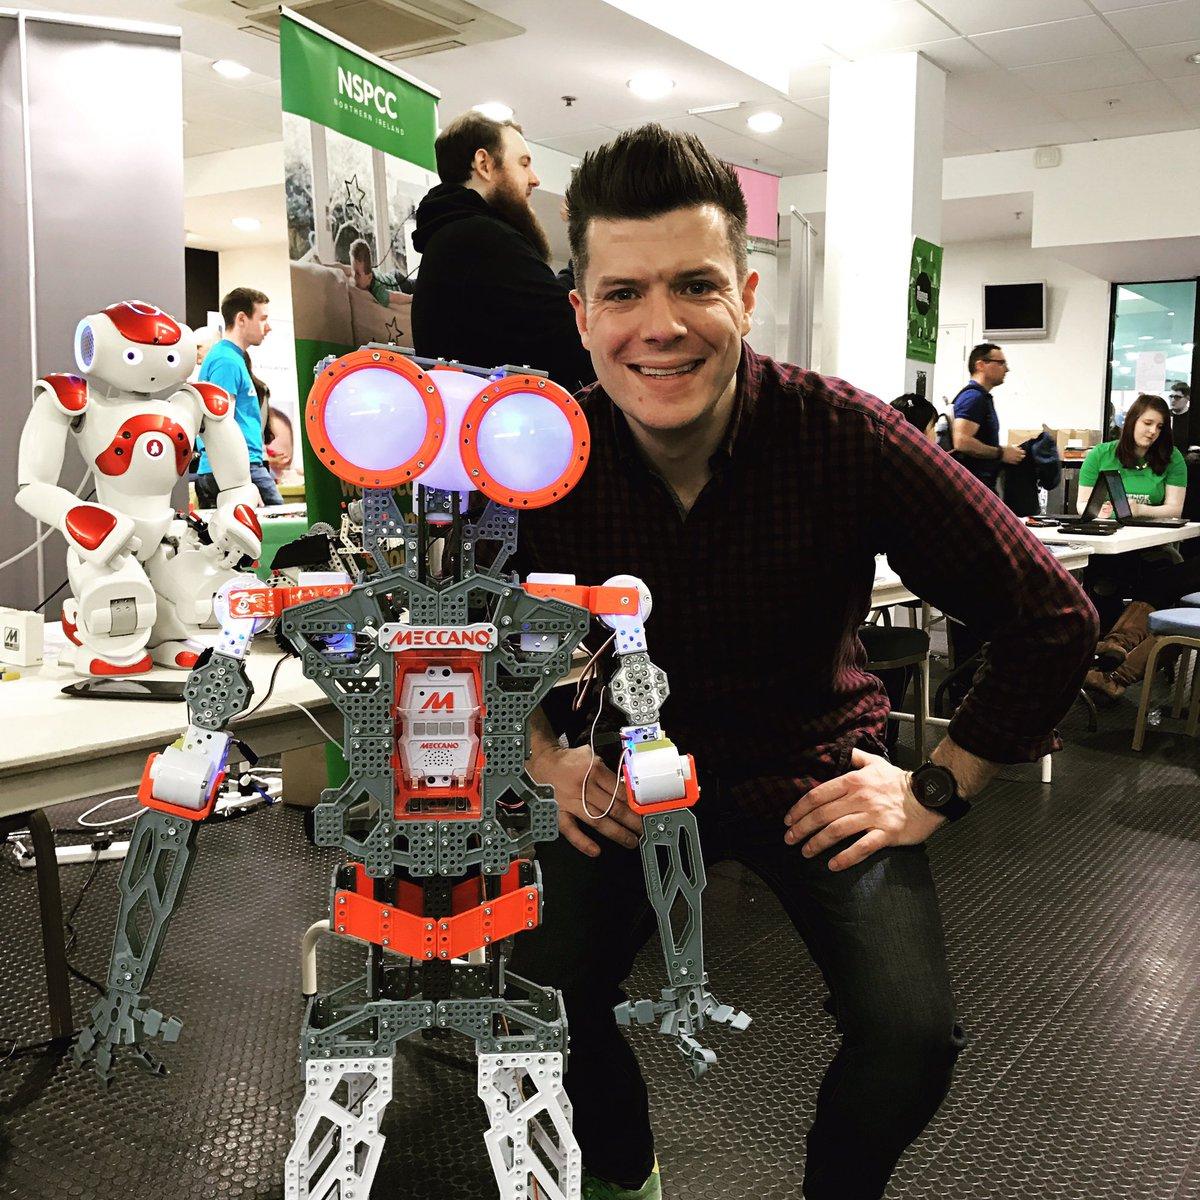 Wayne Denner and Meccano robot